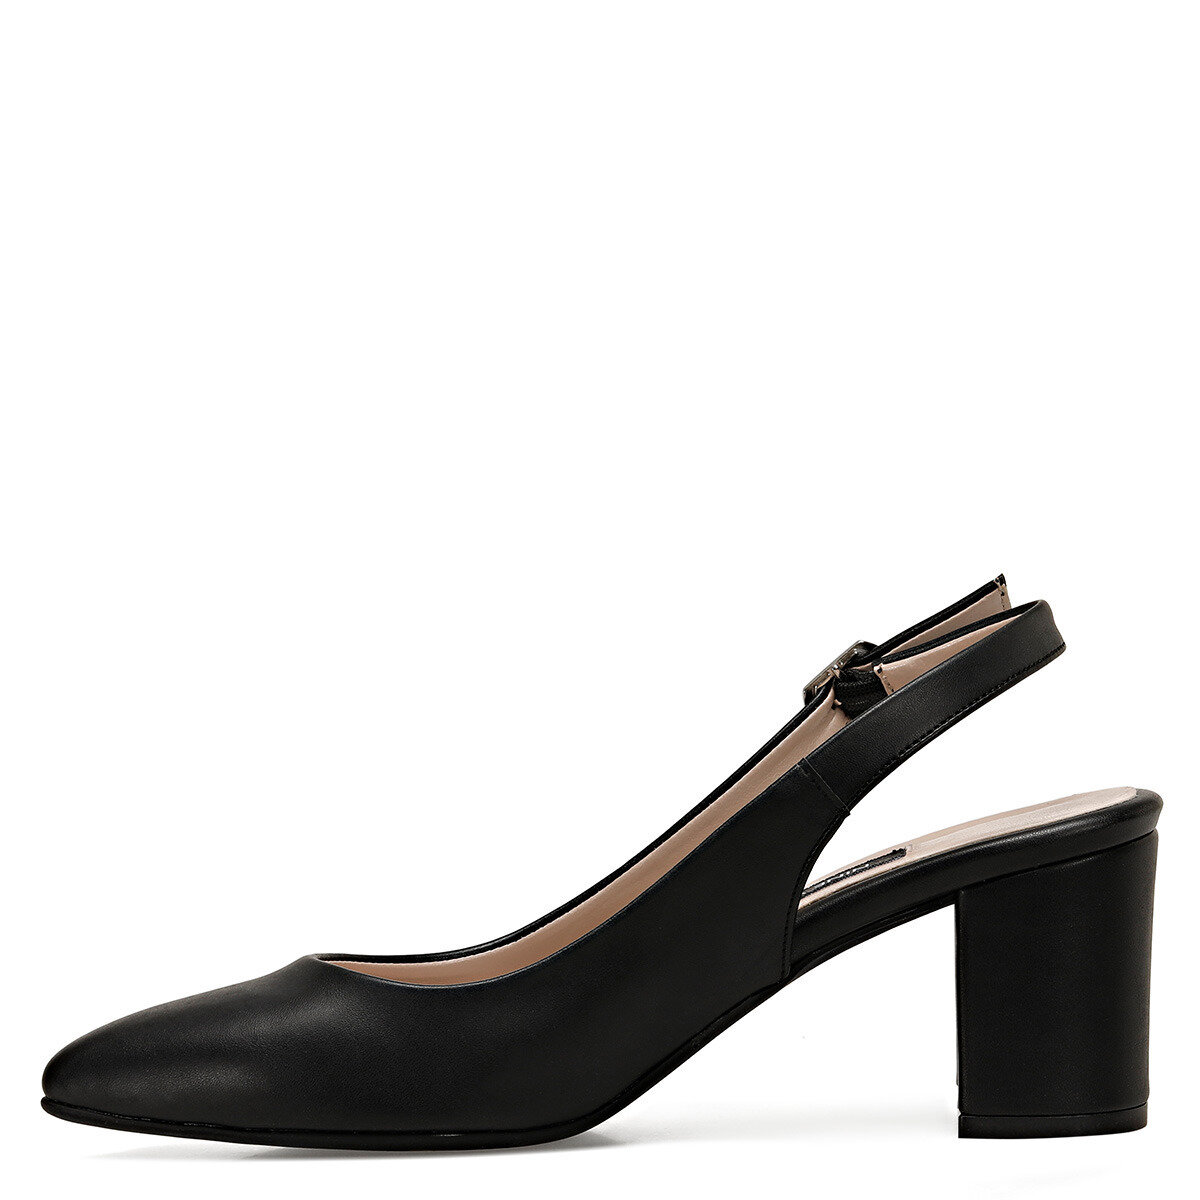 LIZETTO Siyah Kadın Topuklu Ayakkabı